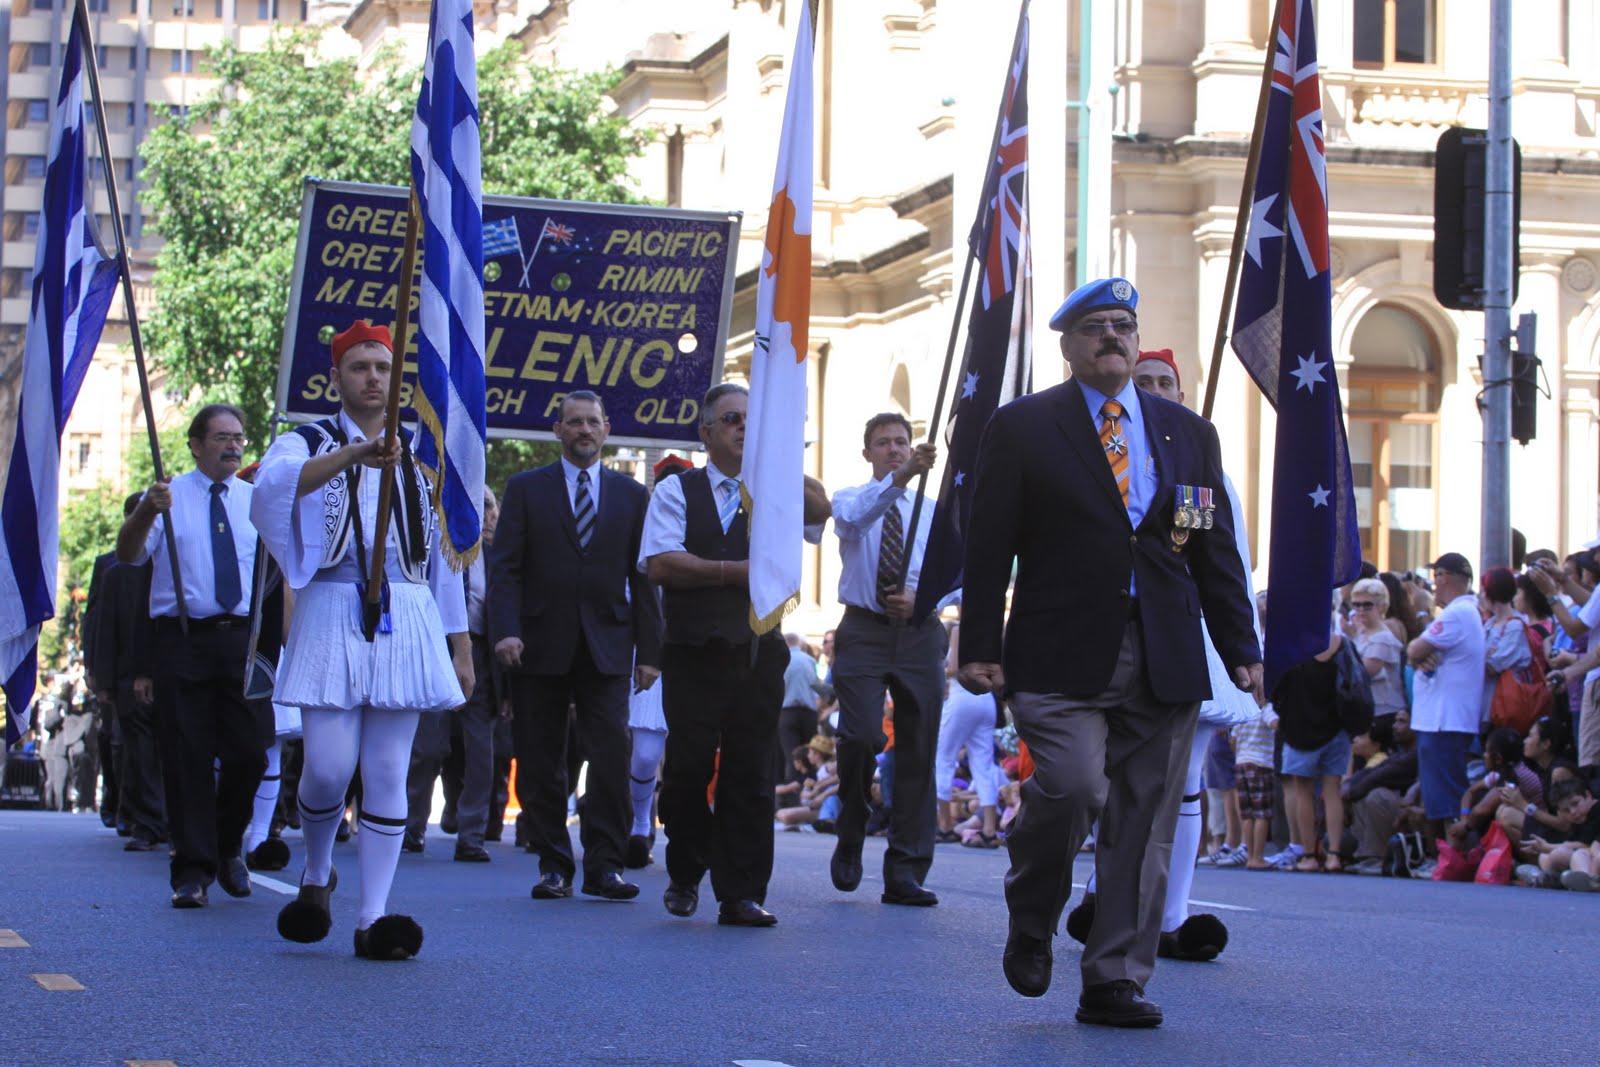 2010+anzac+parade+march...+158 Αυστραλία: Οι ΑΝΖΑC S και οι Έλληνες